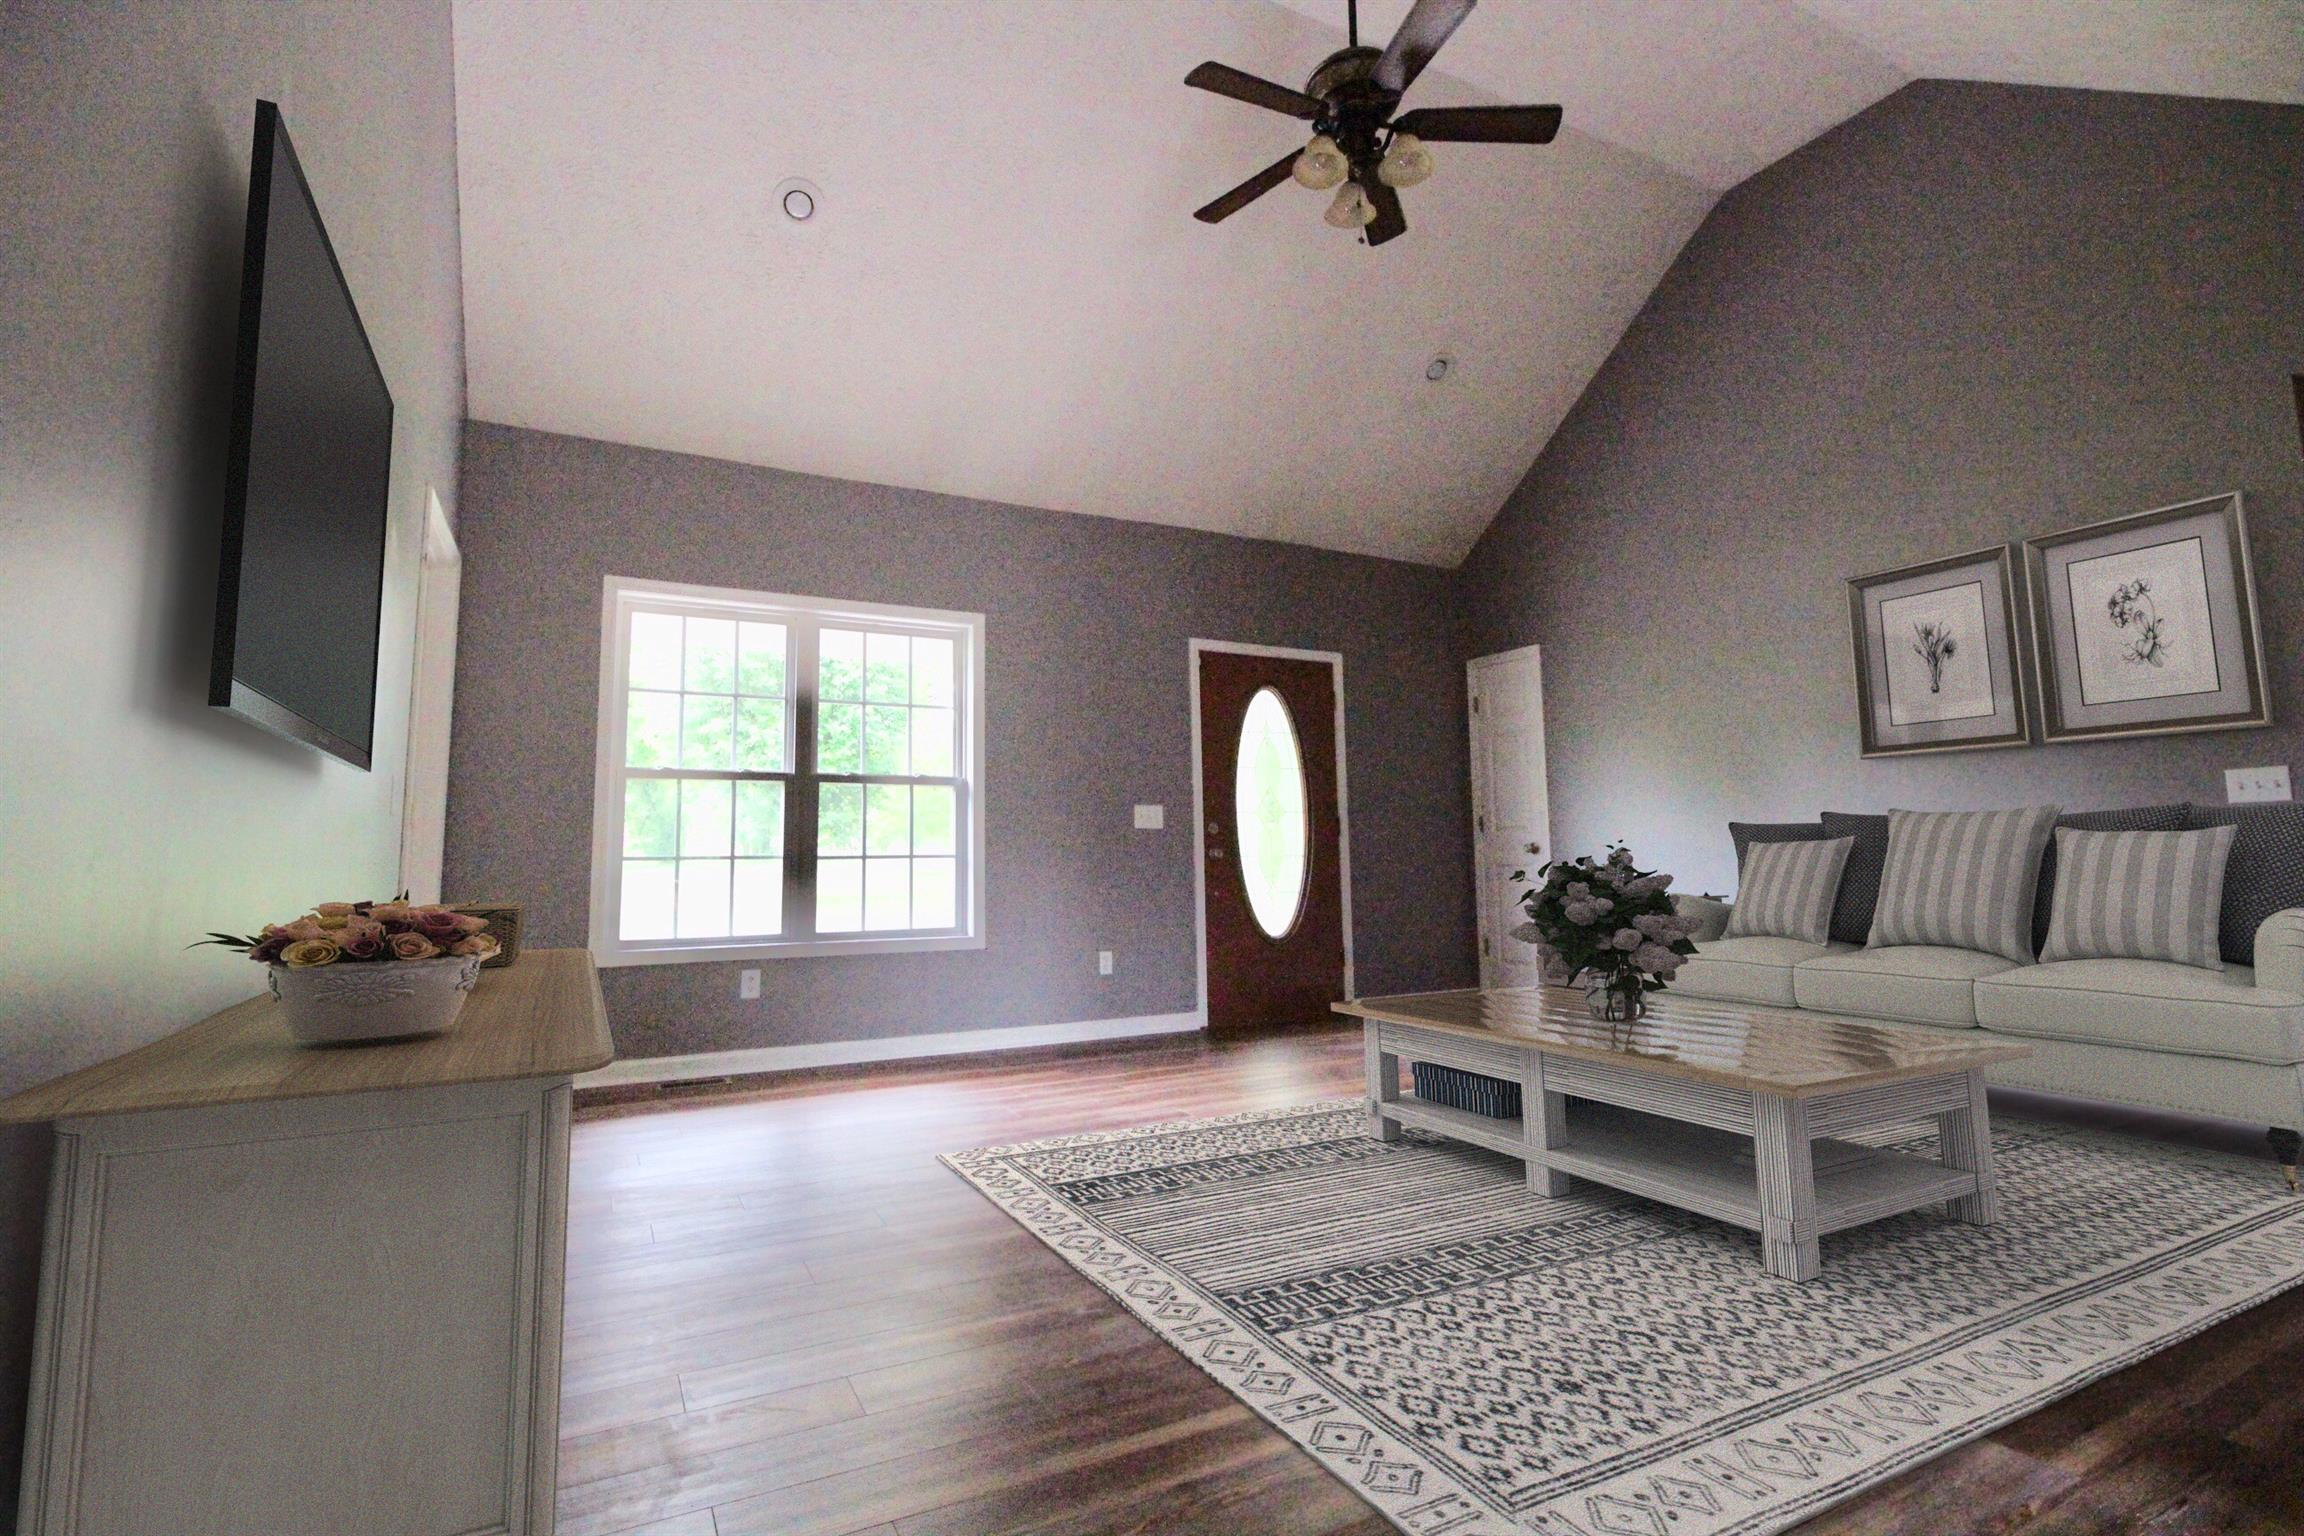 107 Harsh Ln, Castalian Springs, TN 37031 - Castalian Springs, TN real estate listing